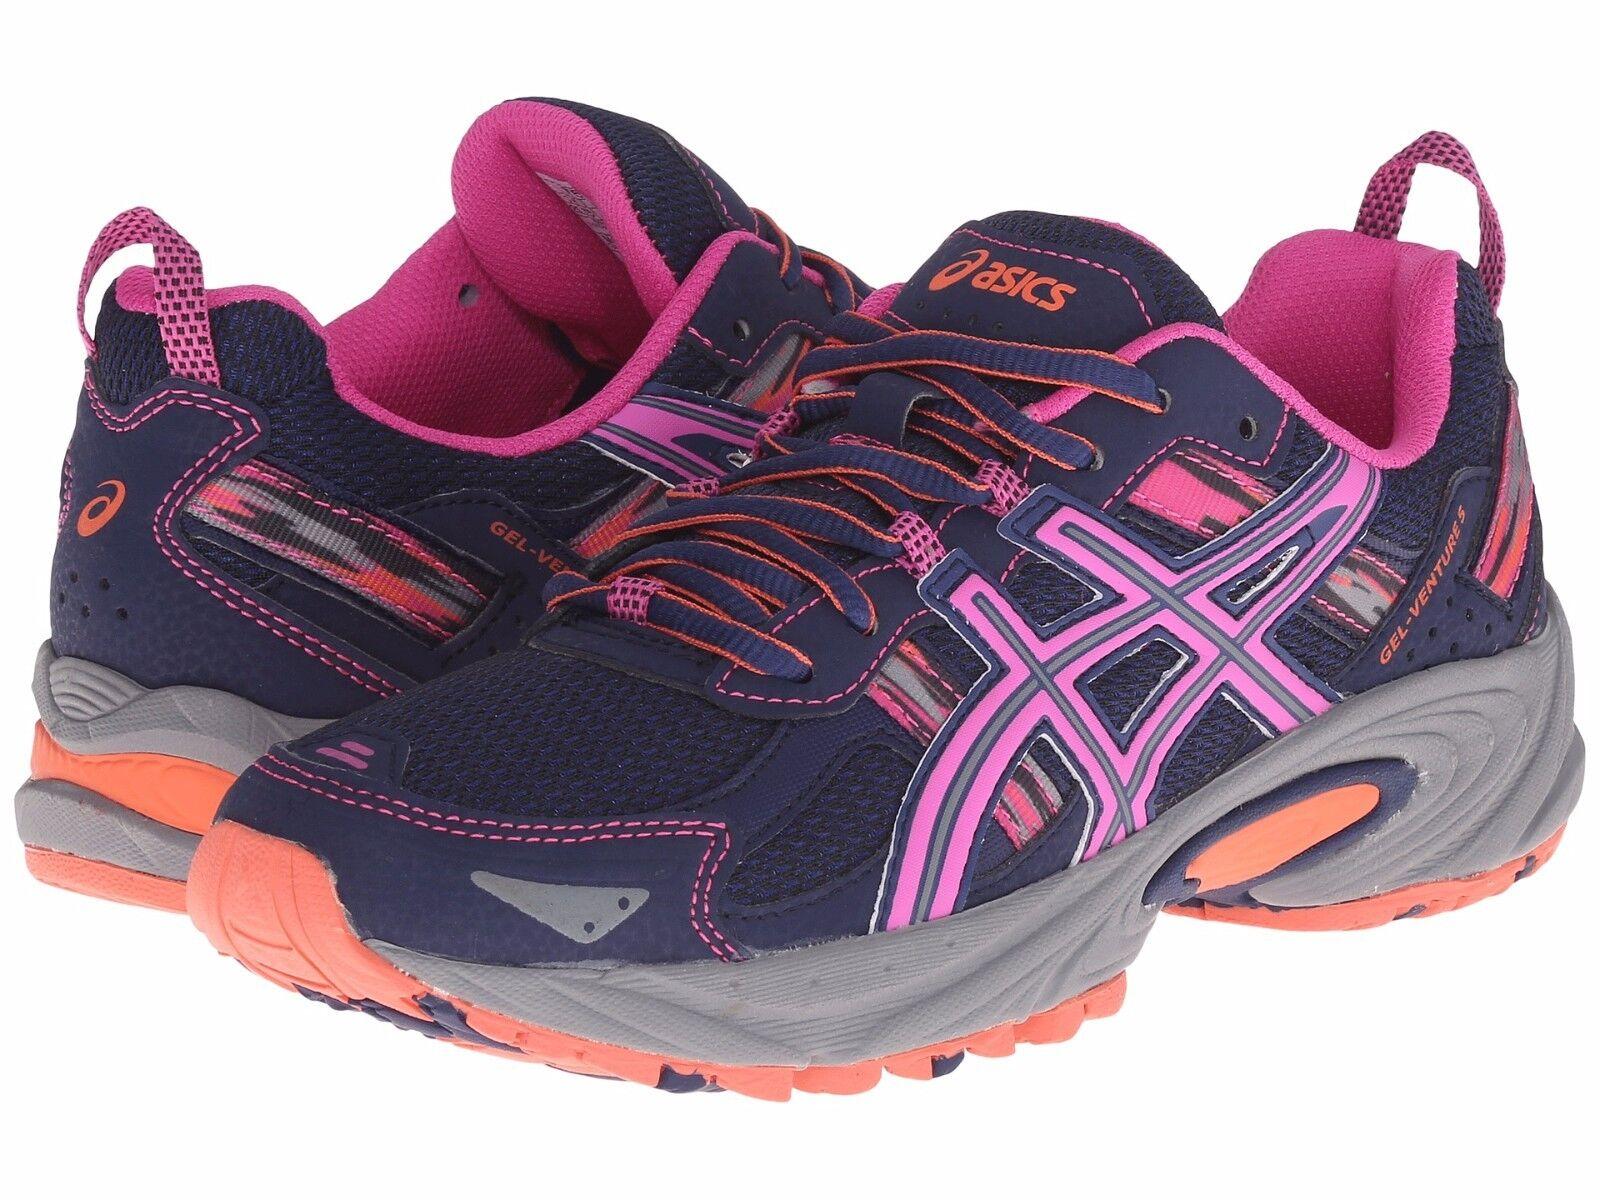 NIB Women's Asics Gel Venture 5 Running Shoes Medium Choose Comfortable Seasonal clearance sale